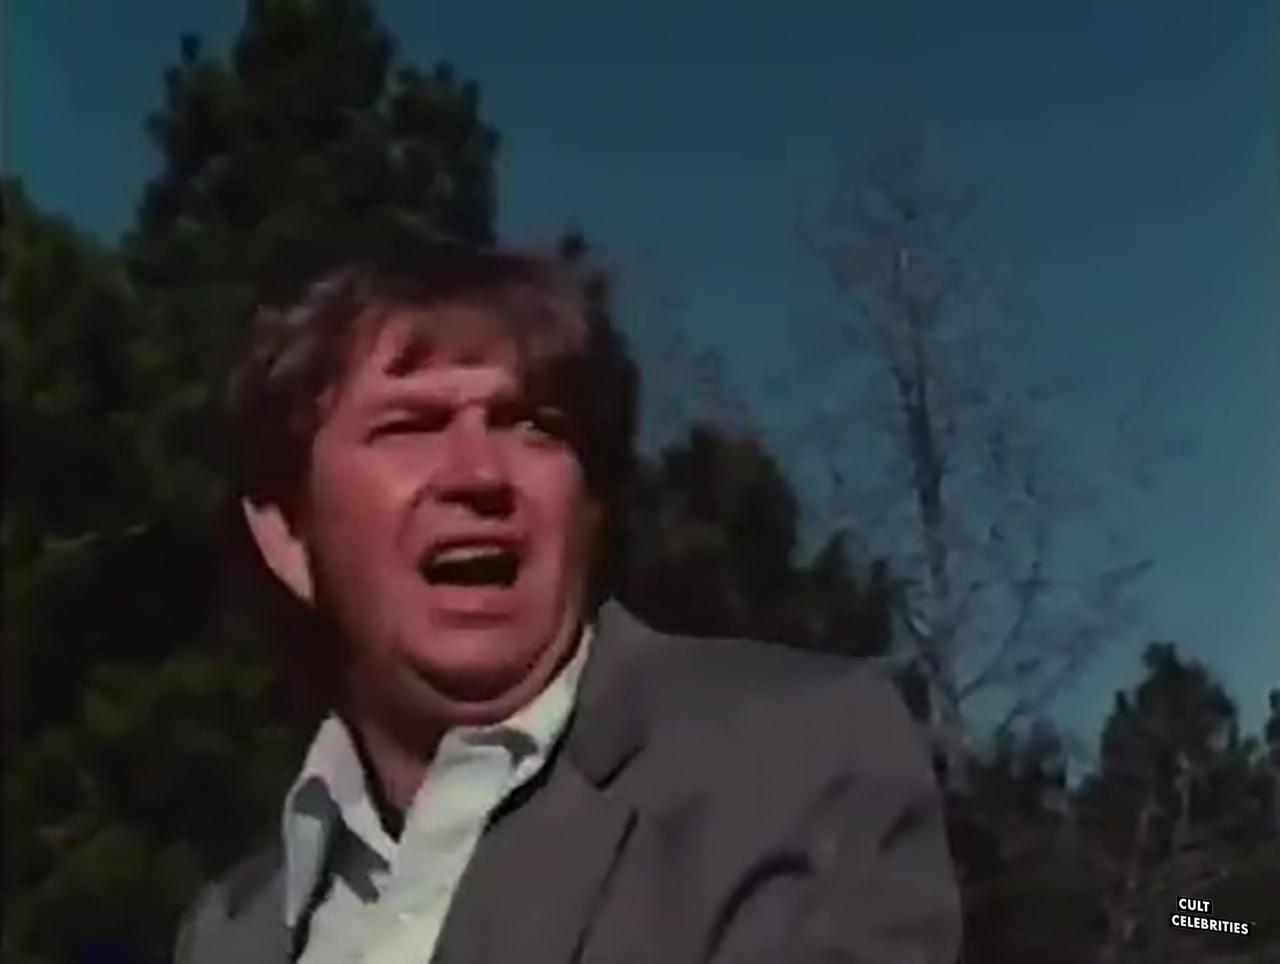 Herschel Mays as William Phillips in Psycho from Texas (1975)